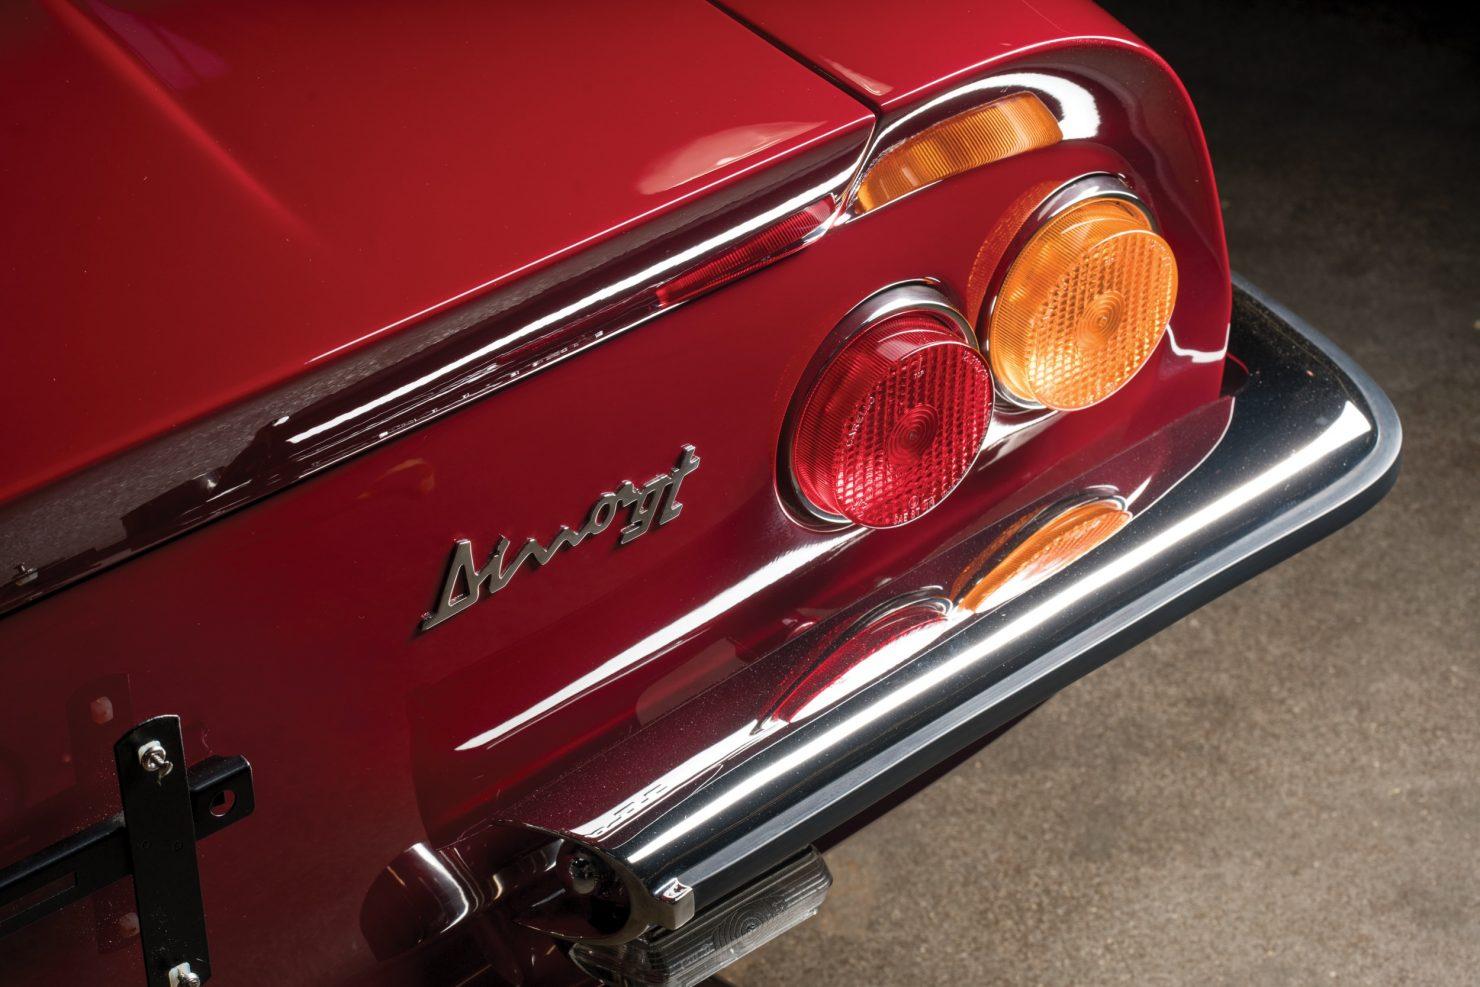 ferrari dino 246 7 1480x987 - 1969 Ferrari Dino 246 GT